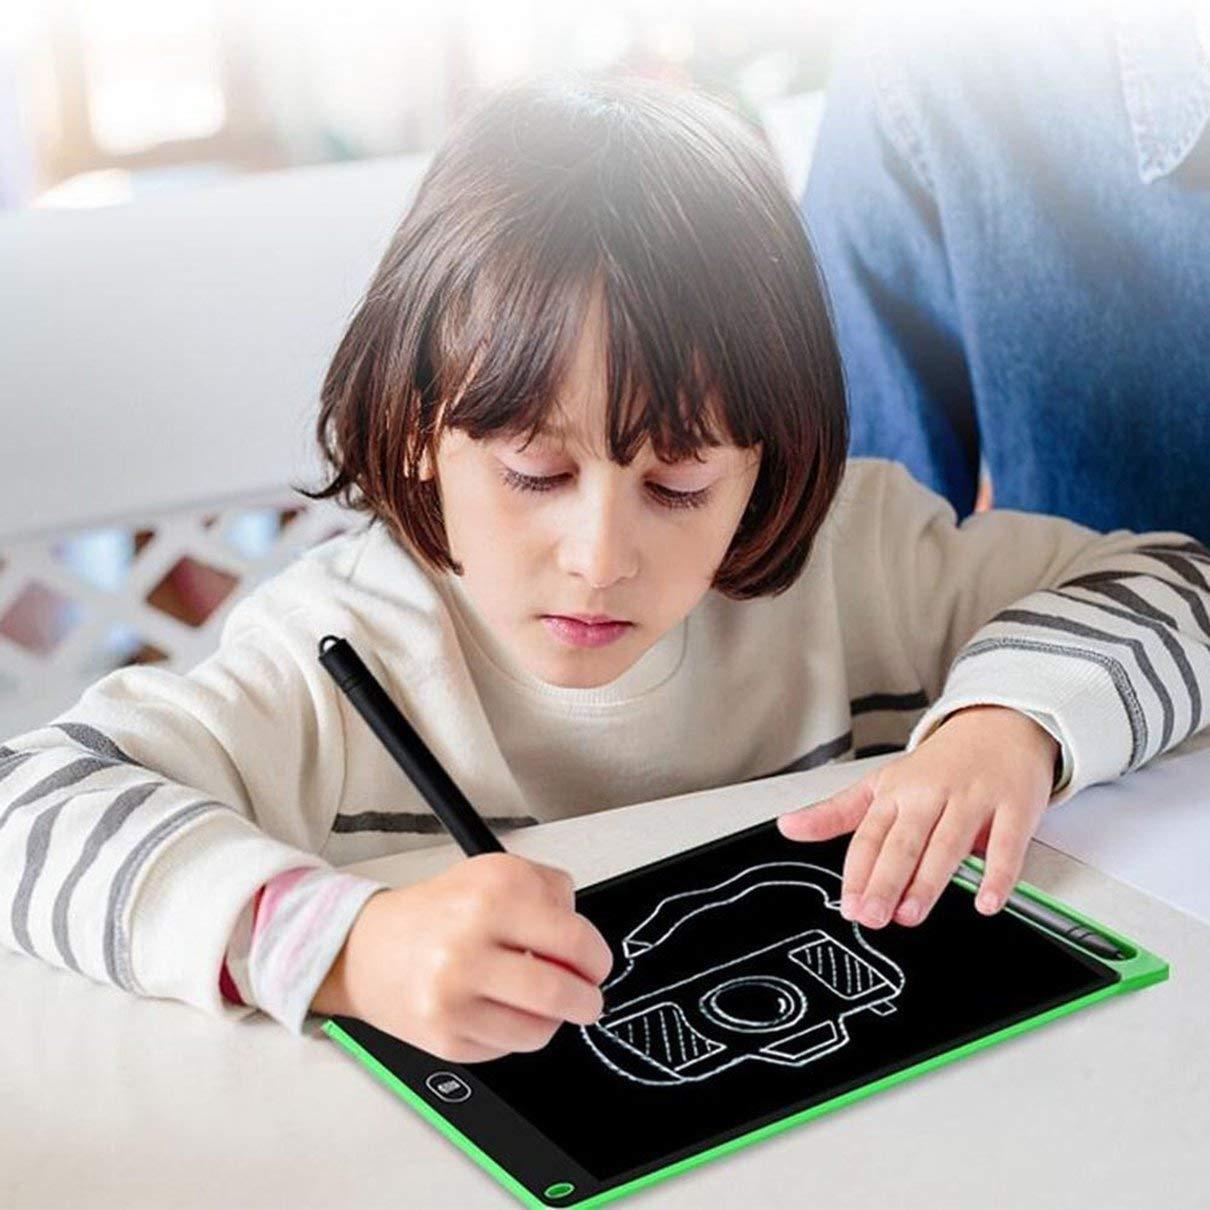 Tableta gr/áfica de Arte Pluma de Dibujo Tableta Digital inal/ámbrica Pluma Escritura Stylus Pen Escritura a Mano Pluma Herramientas de Escritura Togames-ES Negro